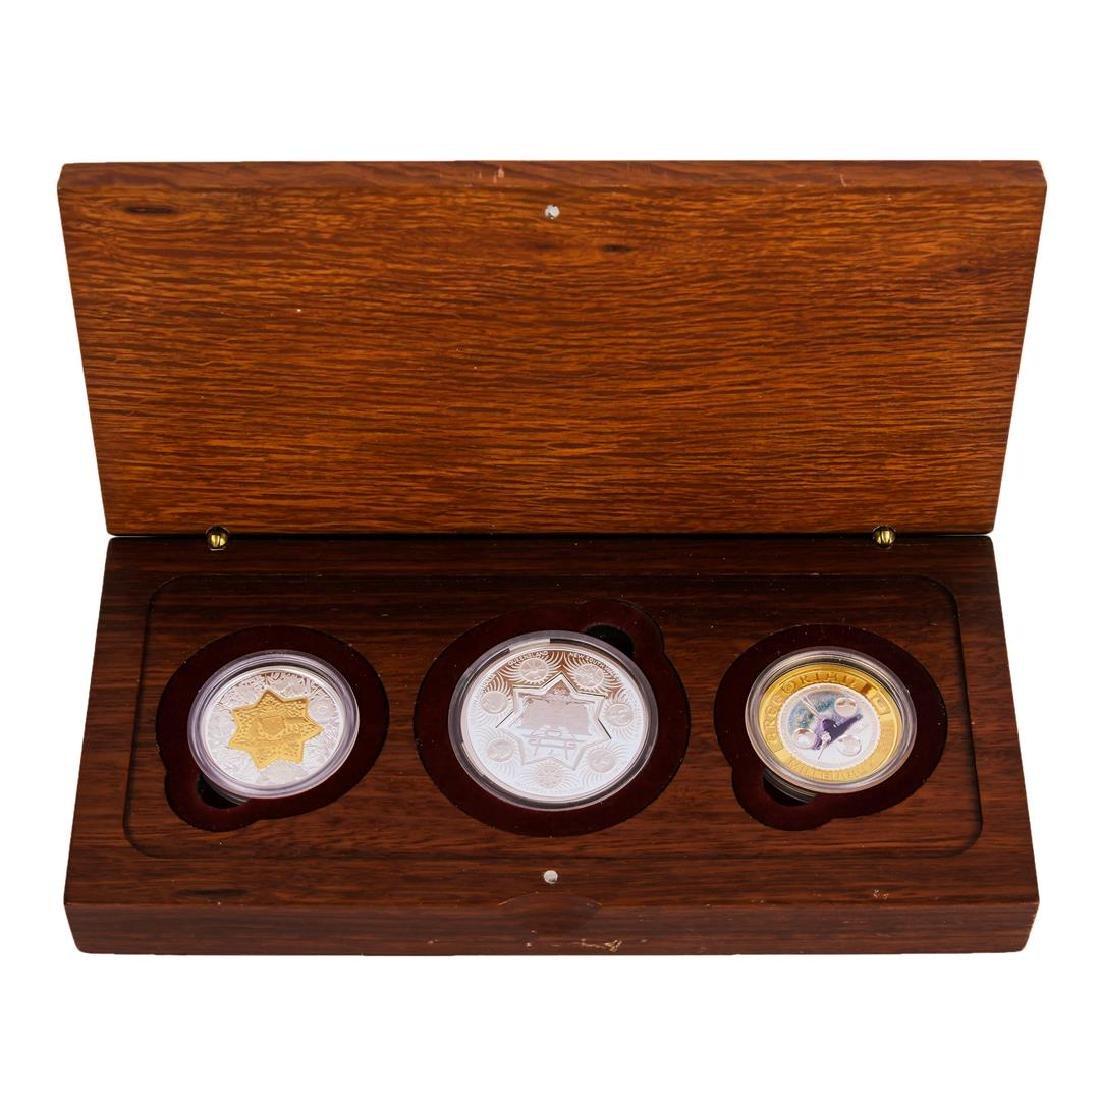 2001 Bi-Metal 21st Century Australian 3 Coin